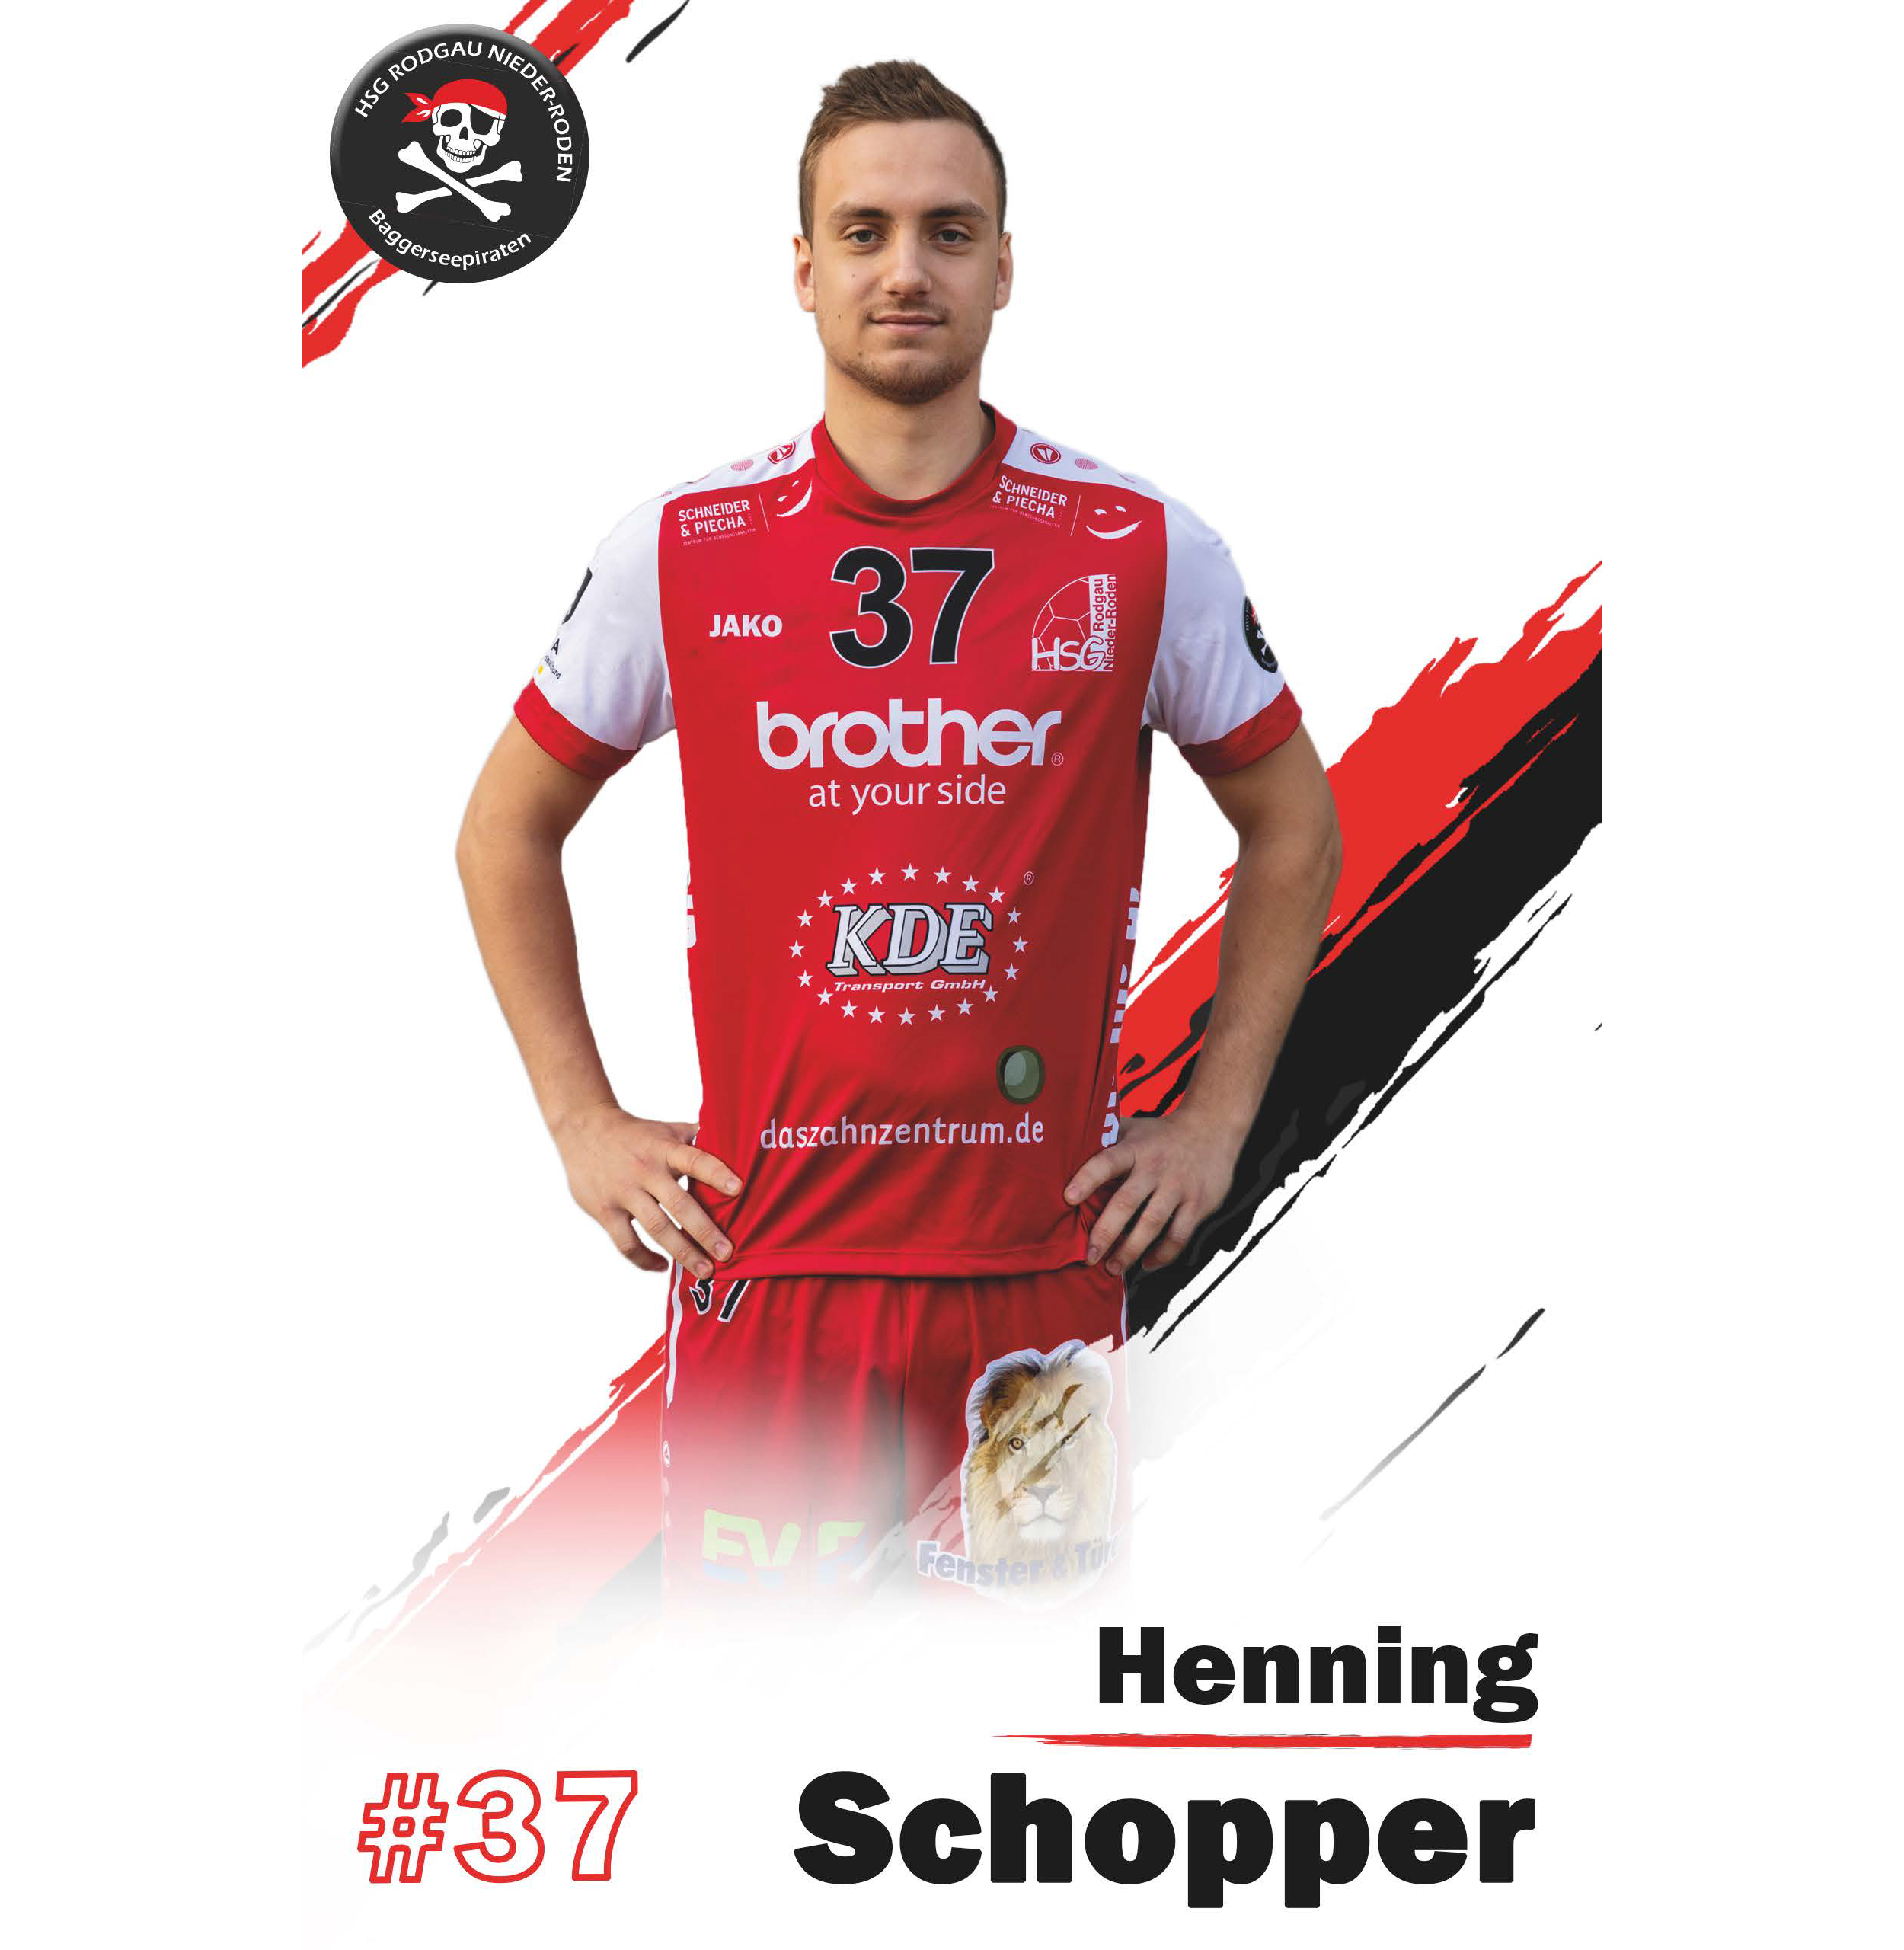 Henning Schopper